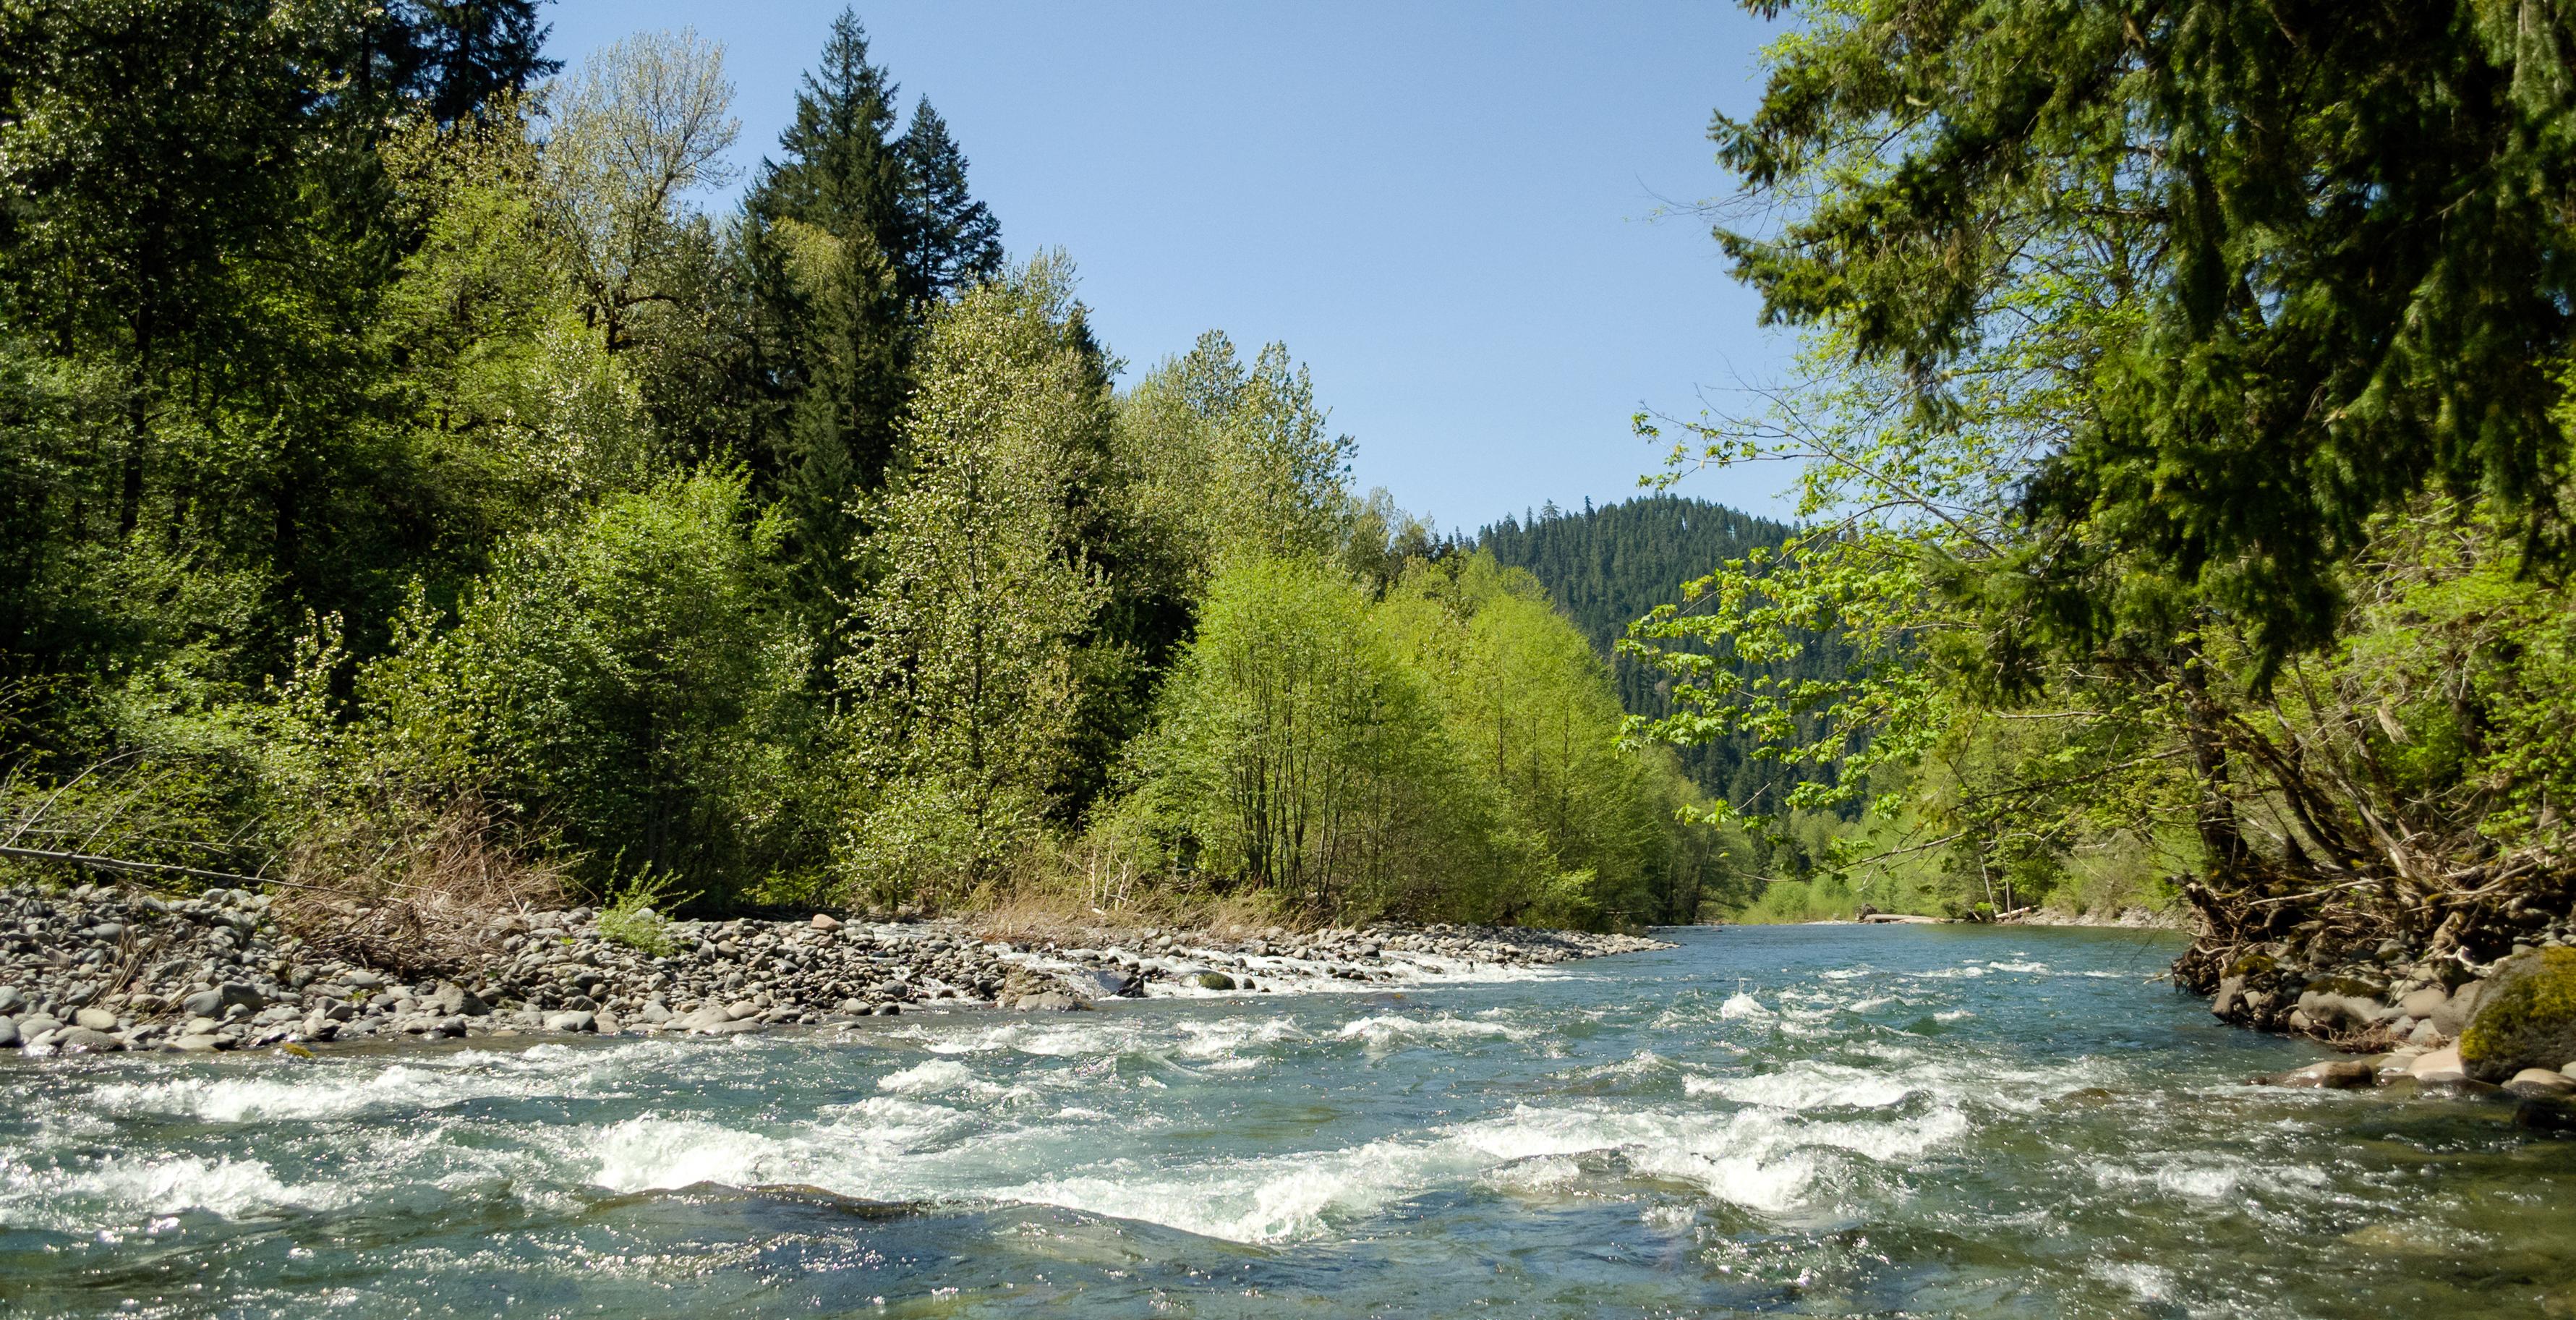 Willamette National Forest, OR - Recreation.gov